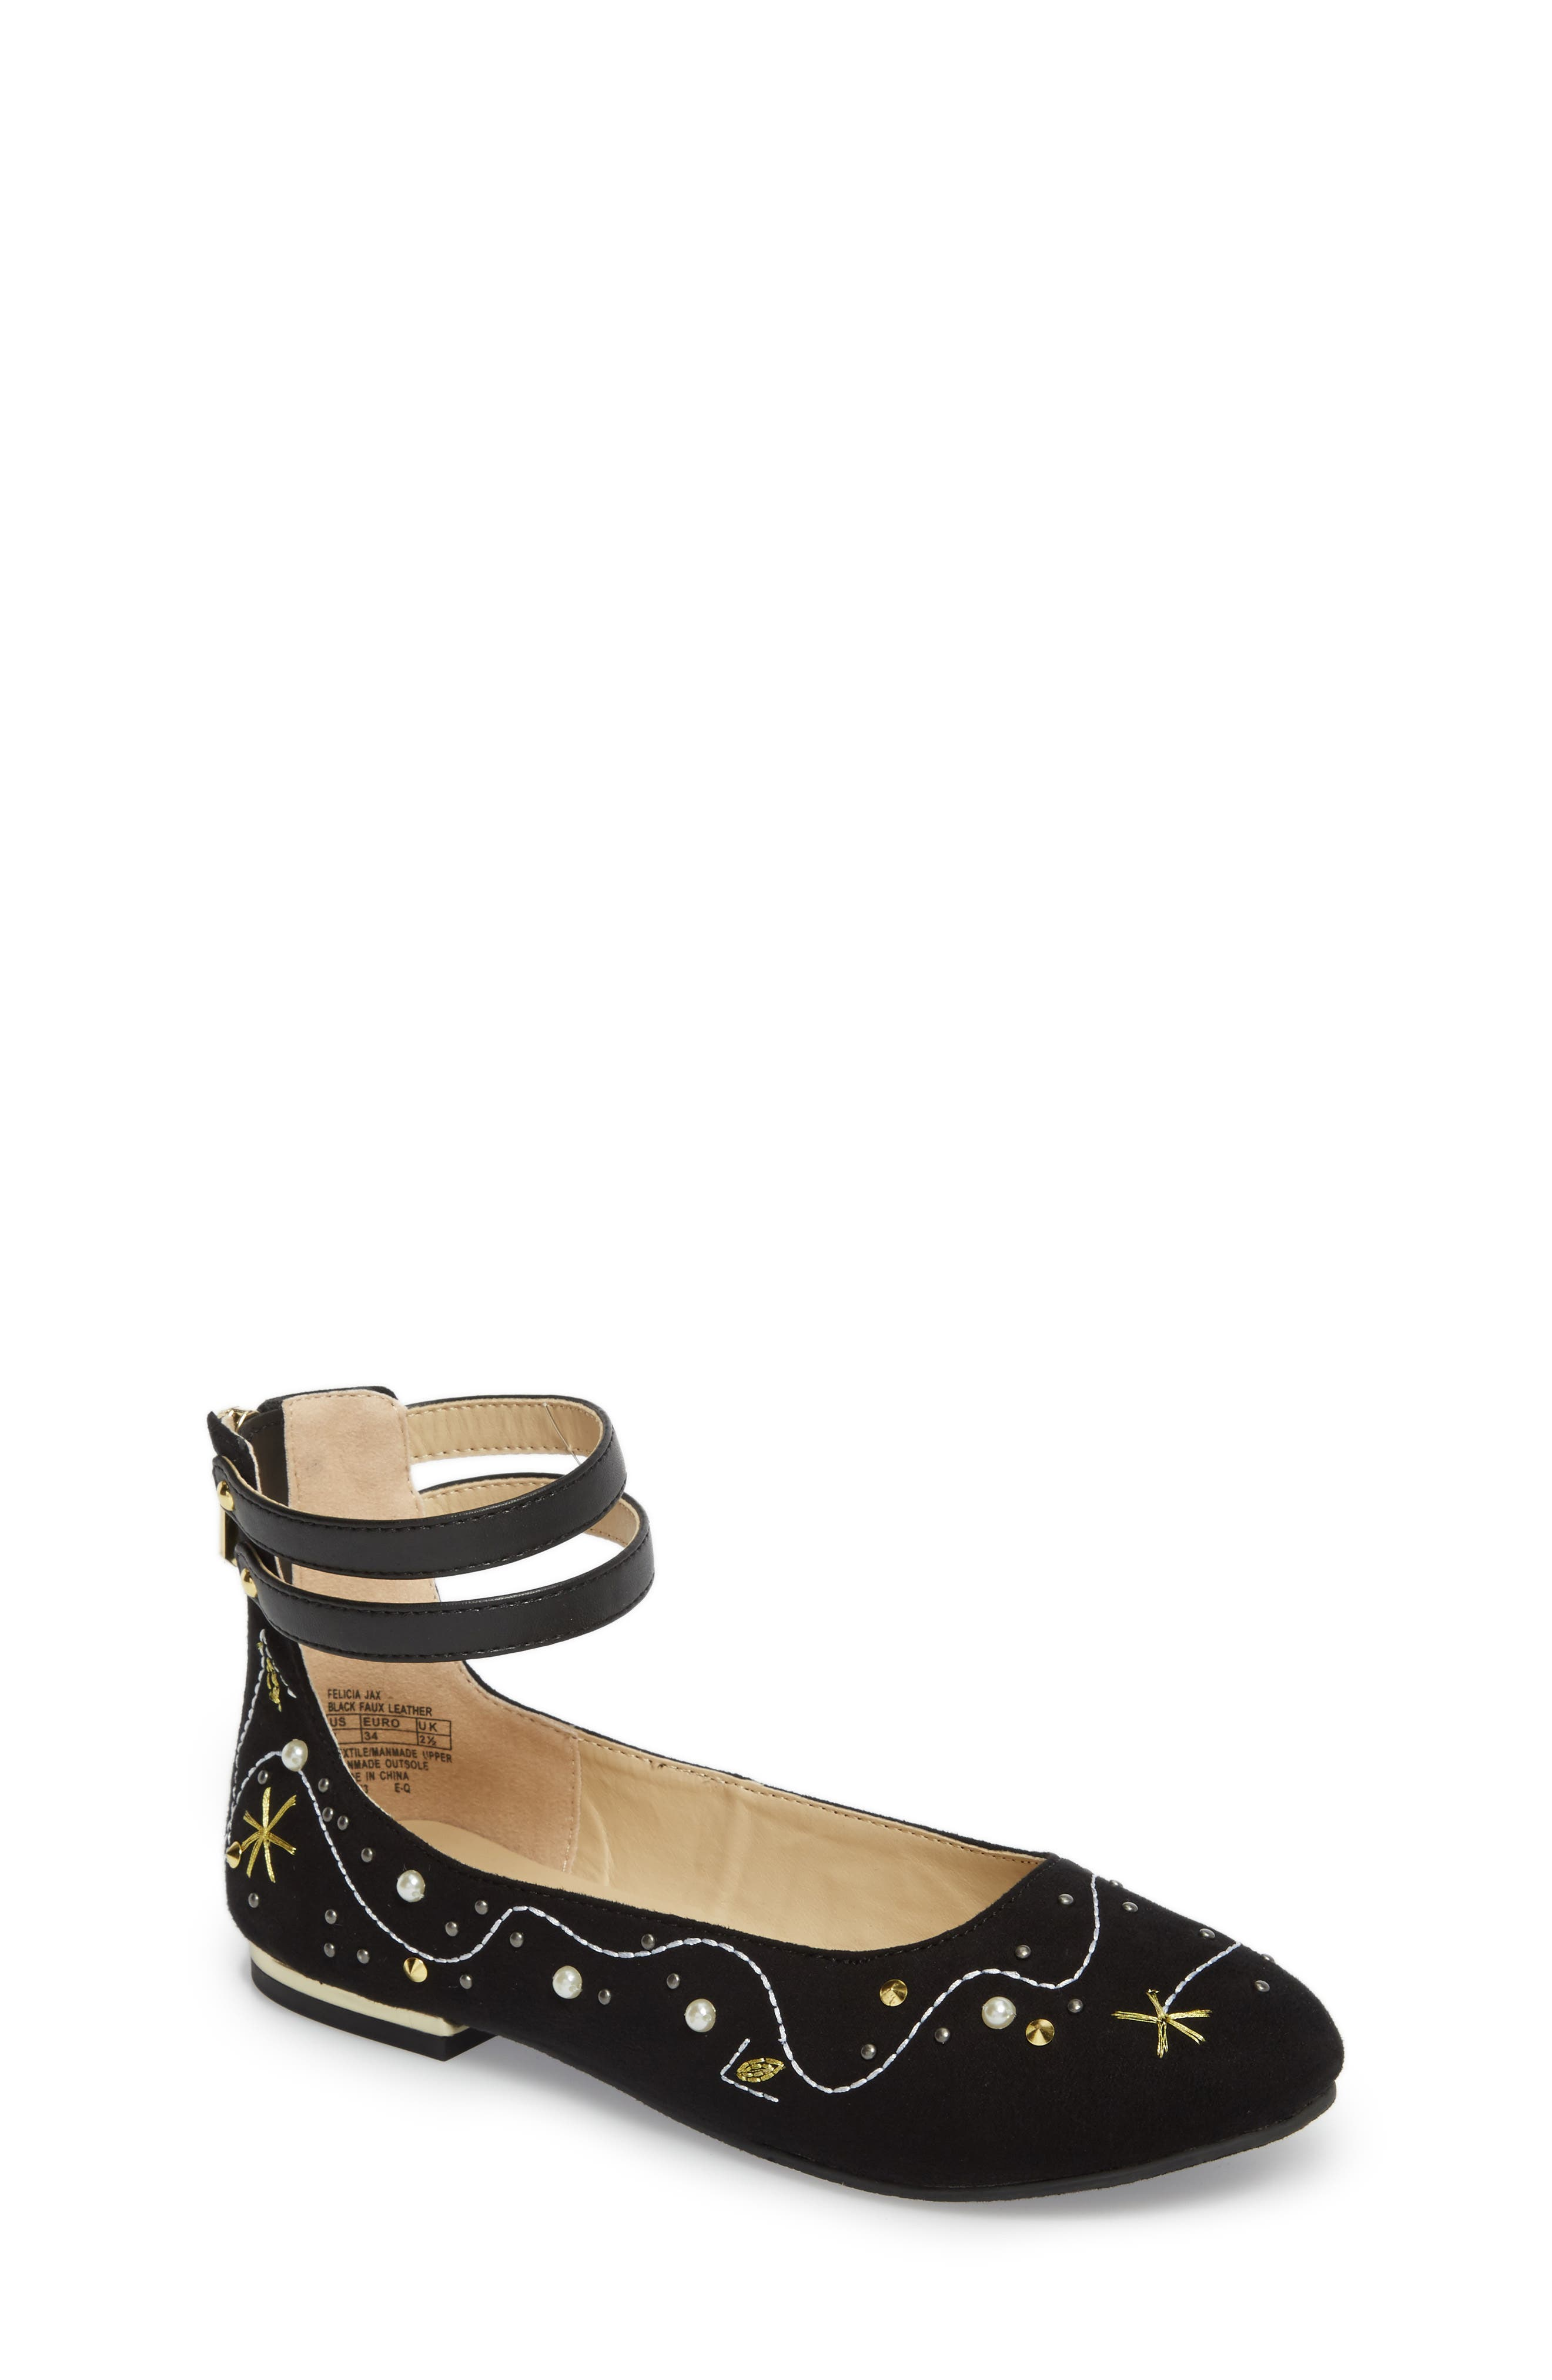 Felicia Jax Embellished Flat,                             Main thumbnail 1, color,                             Black